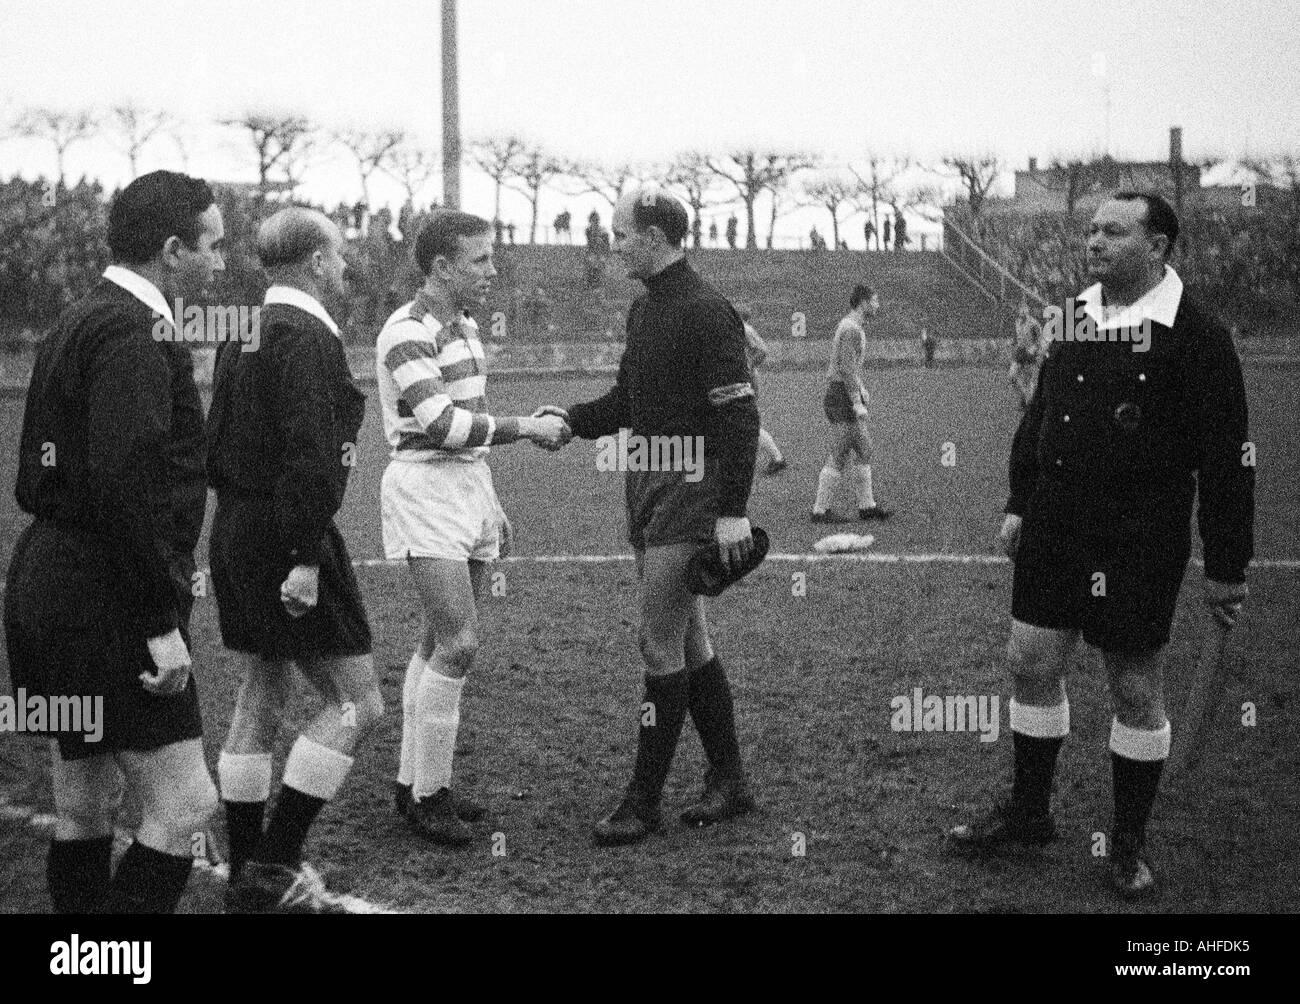 football, DFB Cup, eighth final, 1964/1965, Wedau Stadium in Duisburg, Meidericher SV versus Eintracht Brunswick 0:1, referee Franz Heumann aus Ansbach (2.f.l.) and assistants, team leader Werner Kraemer (Duisburg, 3.f.l.) and keeper Hans Jaecker (Braunsc - Stock Image